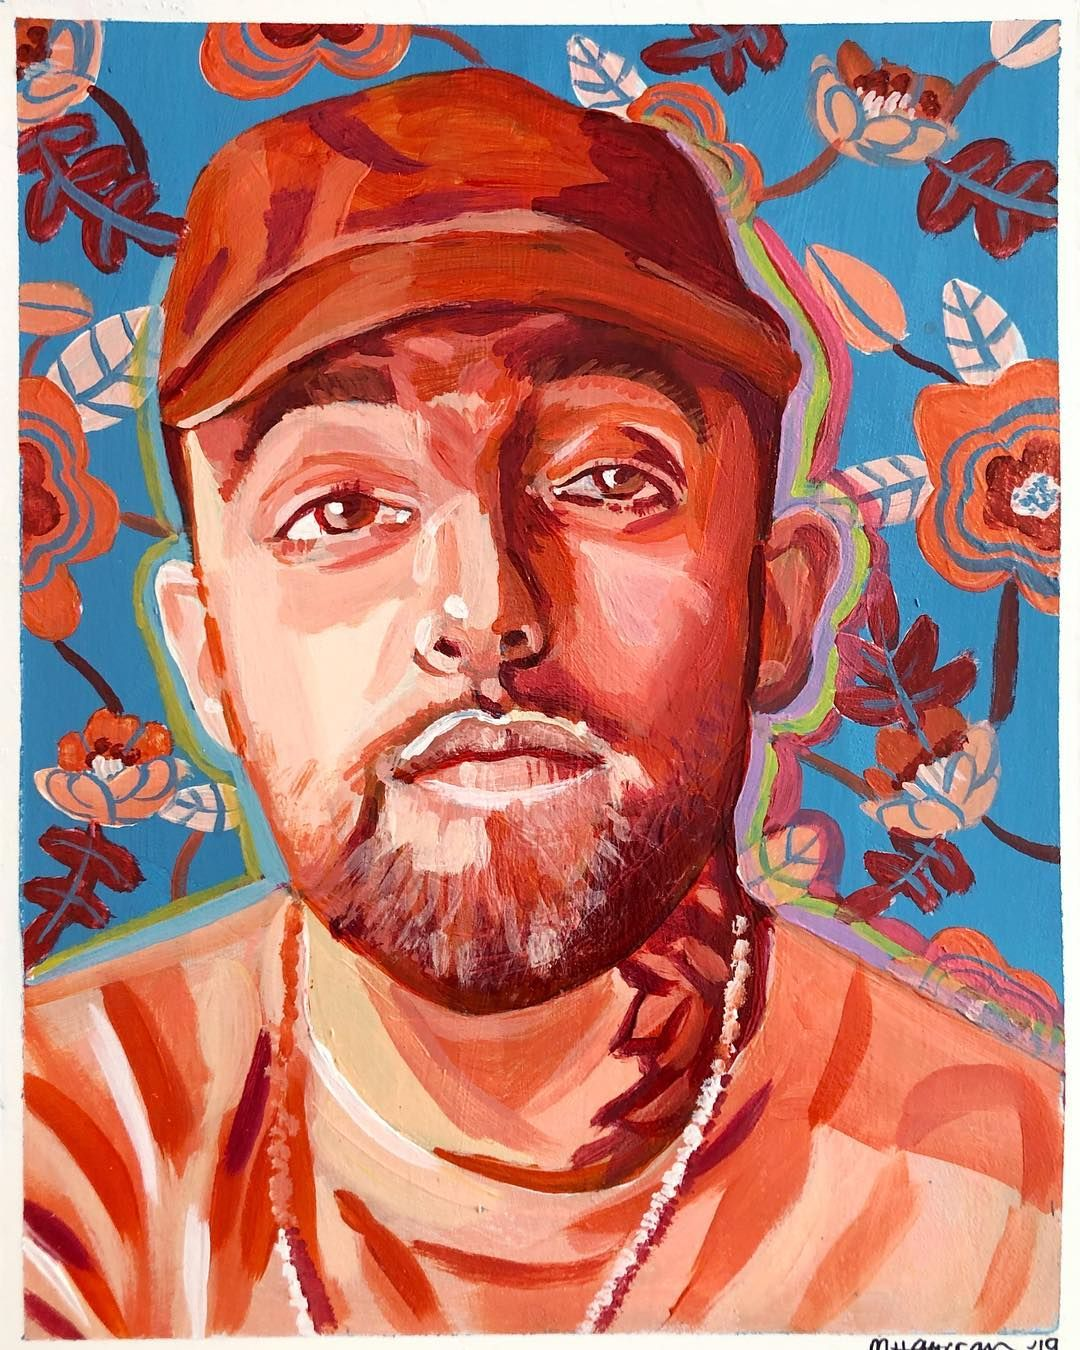 Practice Practice Practiceeee W Macmiller Art Artist Mac Music Musician Design Drawing Rapper Art Art Artist